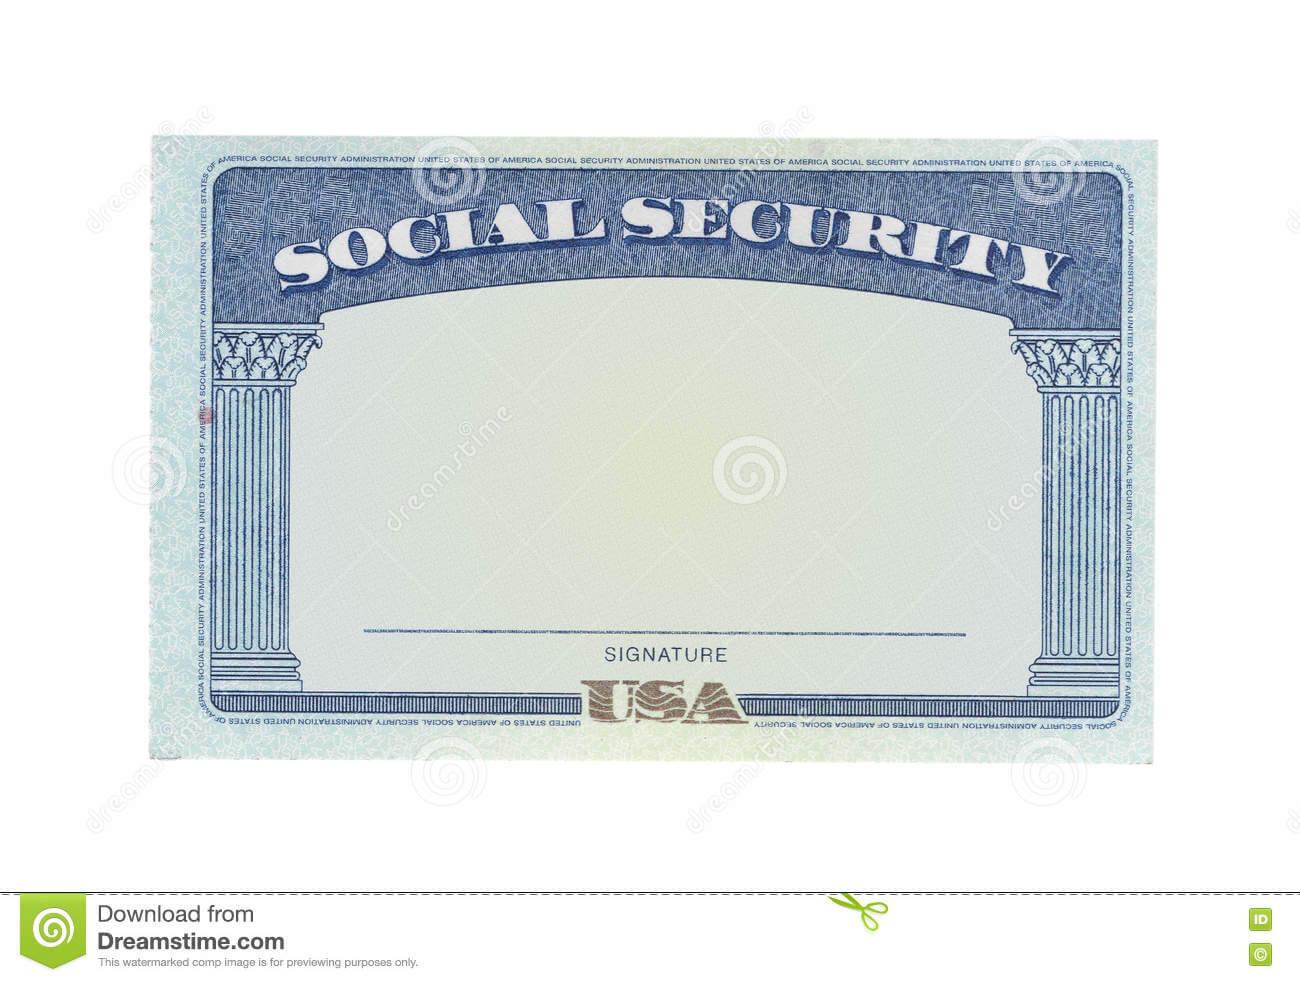 Blank Social Security Card Stock Photos - Download 122 With Blank Social Security Card Template